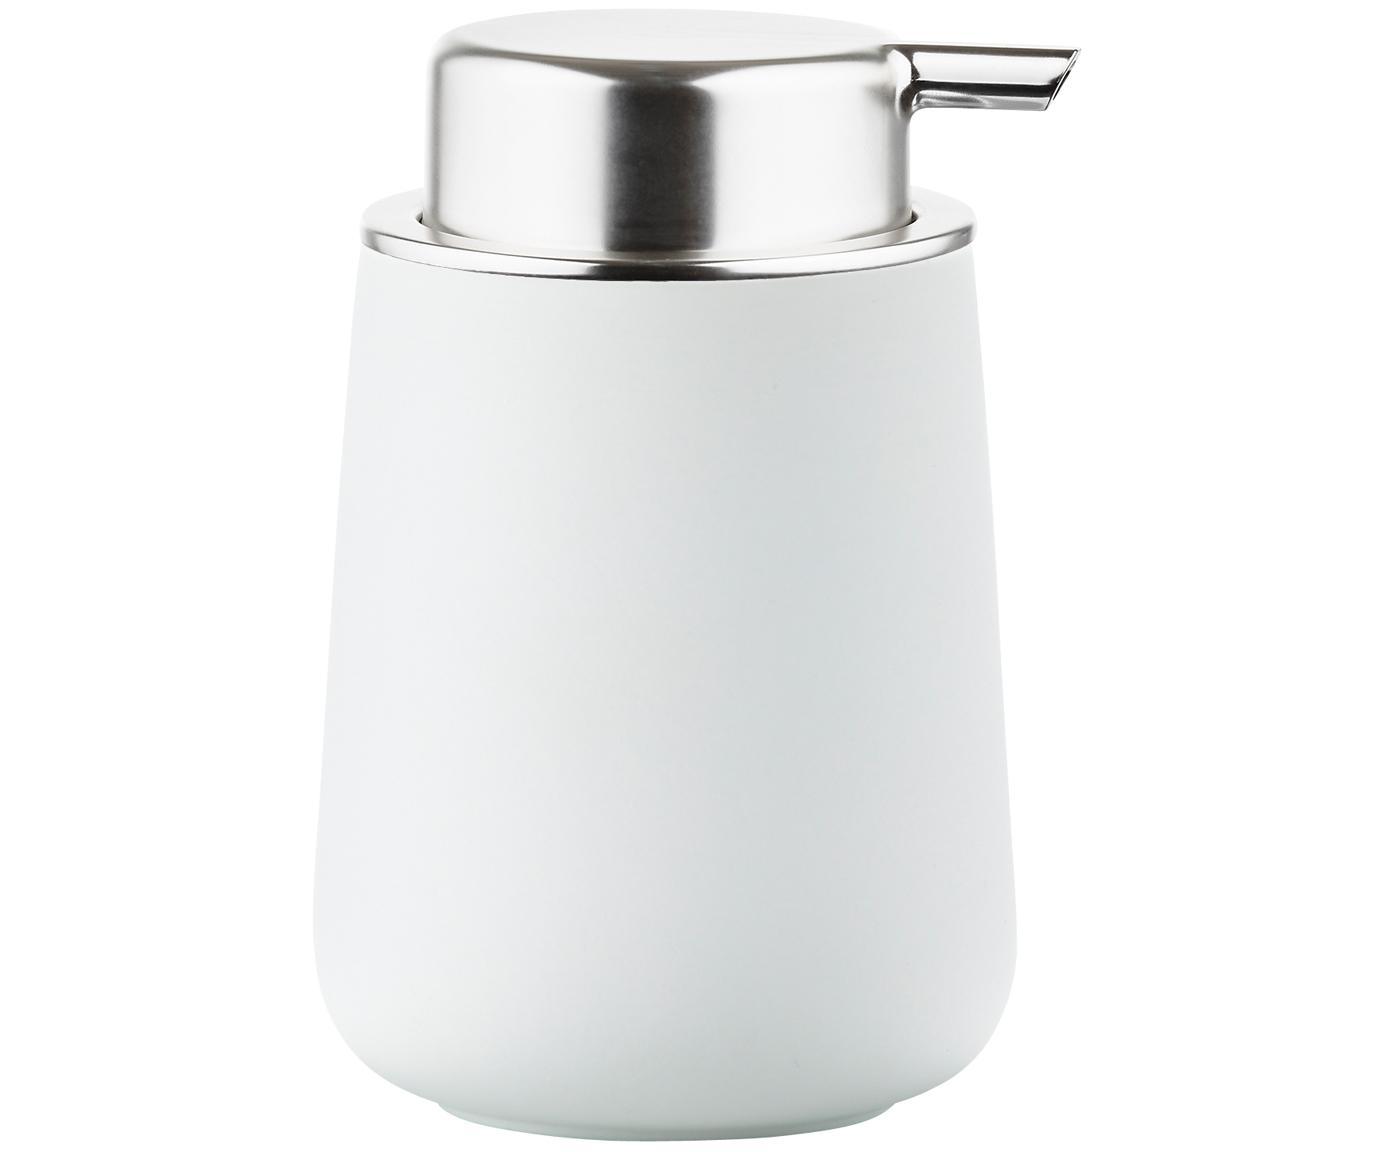 Dispenser sapone in porcellana Nova One, Contenitore: porcellana, Bianco opaco, argento, Ø 8 x Alt. 12 cm